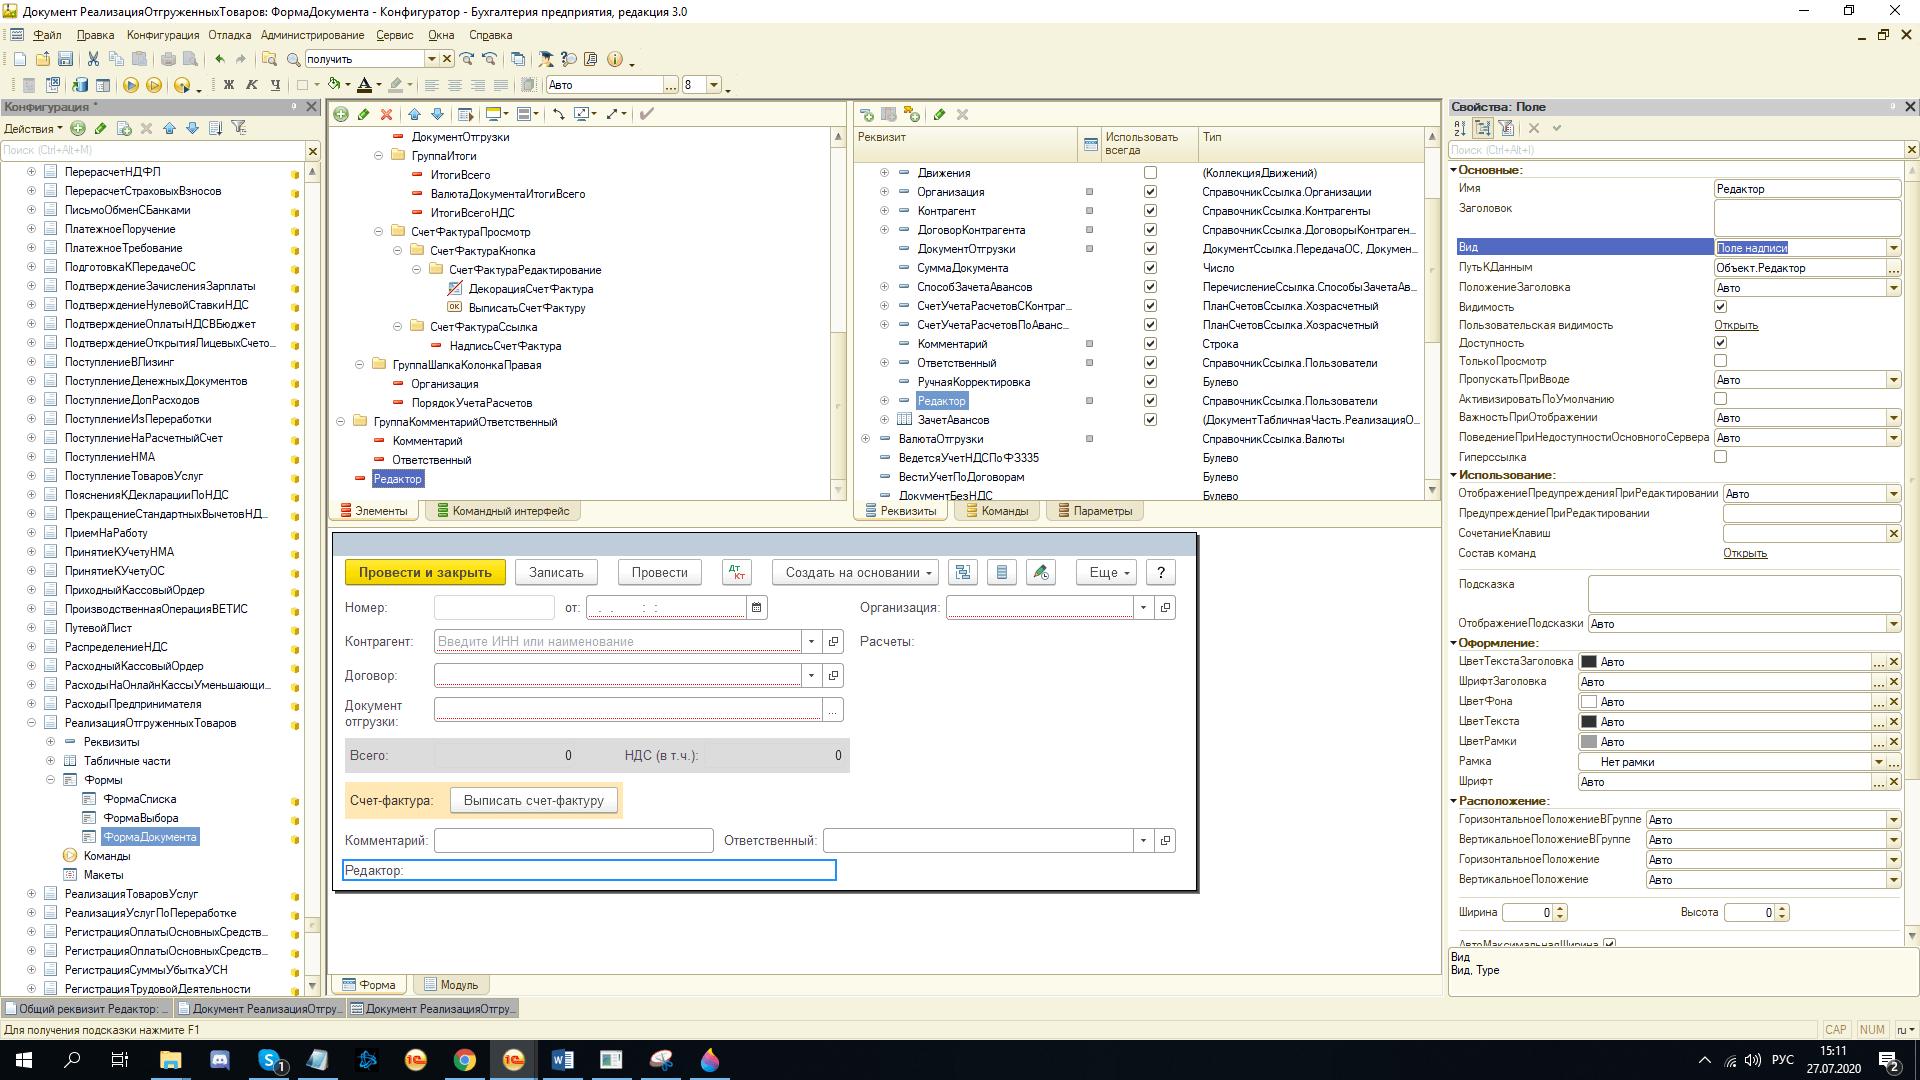 работа с формой объекта 1С 8.3